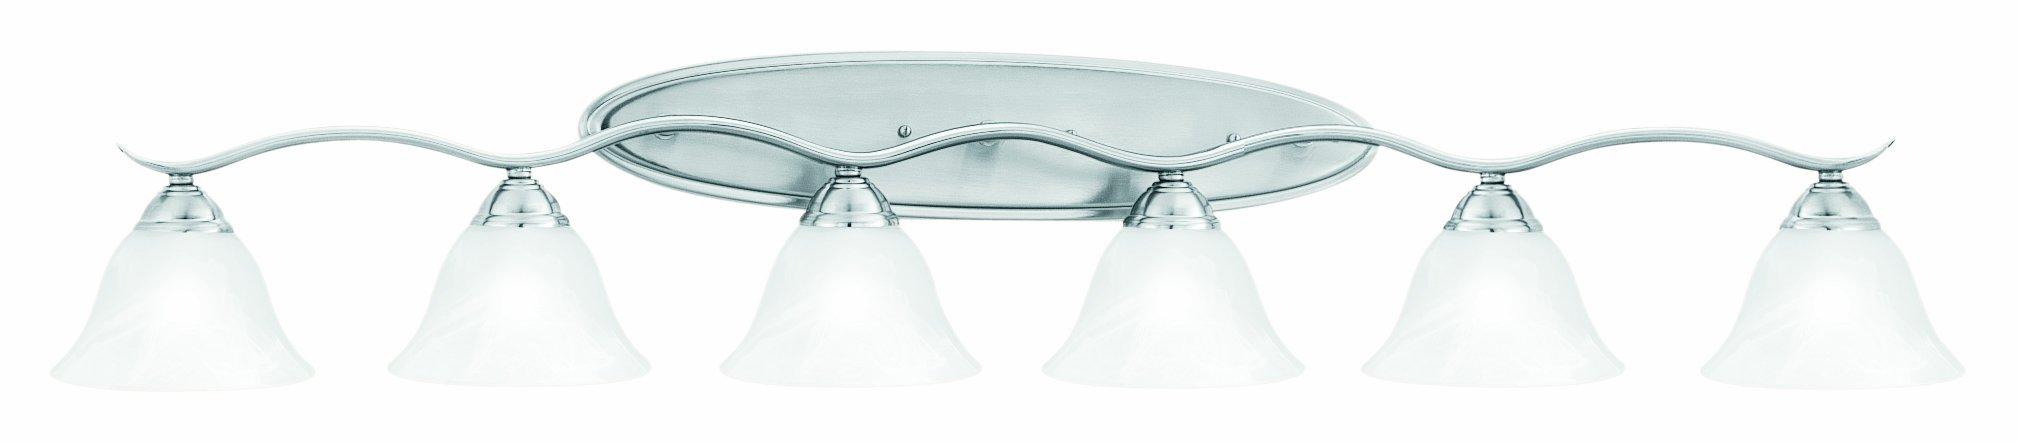 Thomas Lighting SL748678 Prestige Bath Light, Brushed Nickel